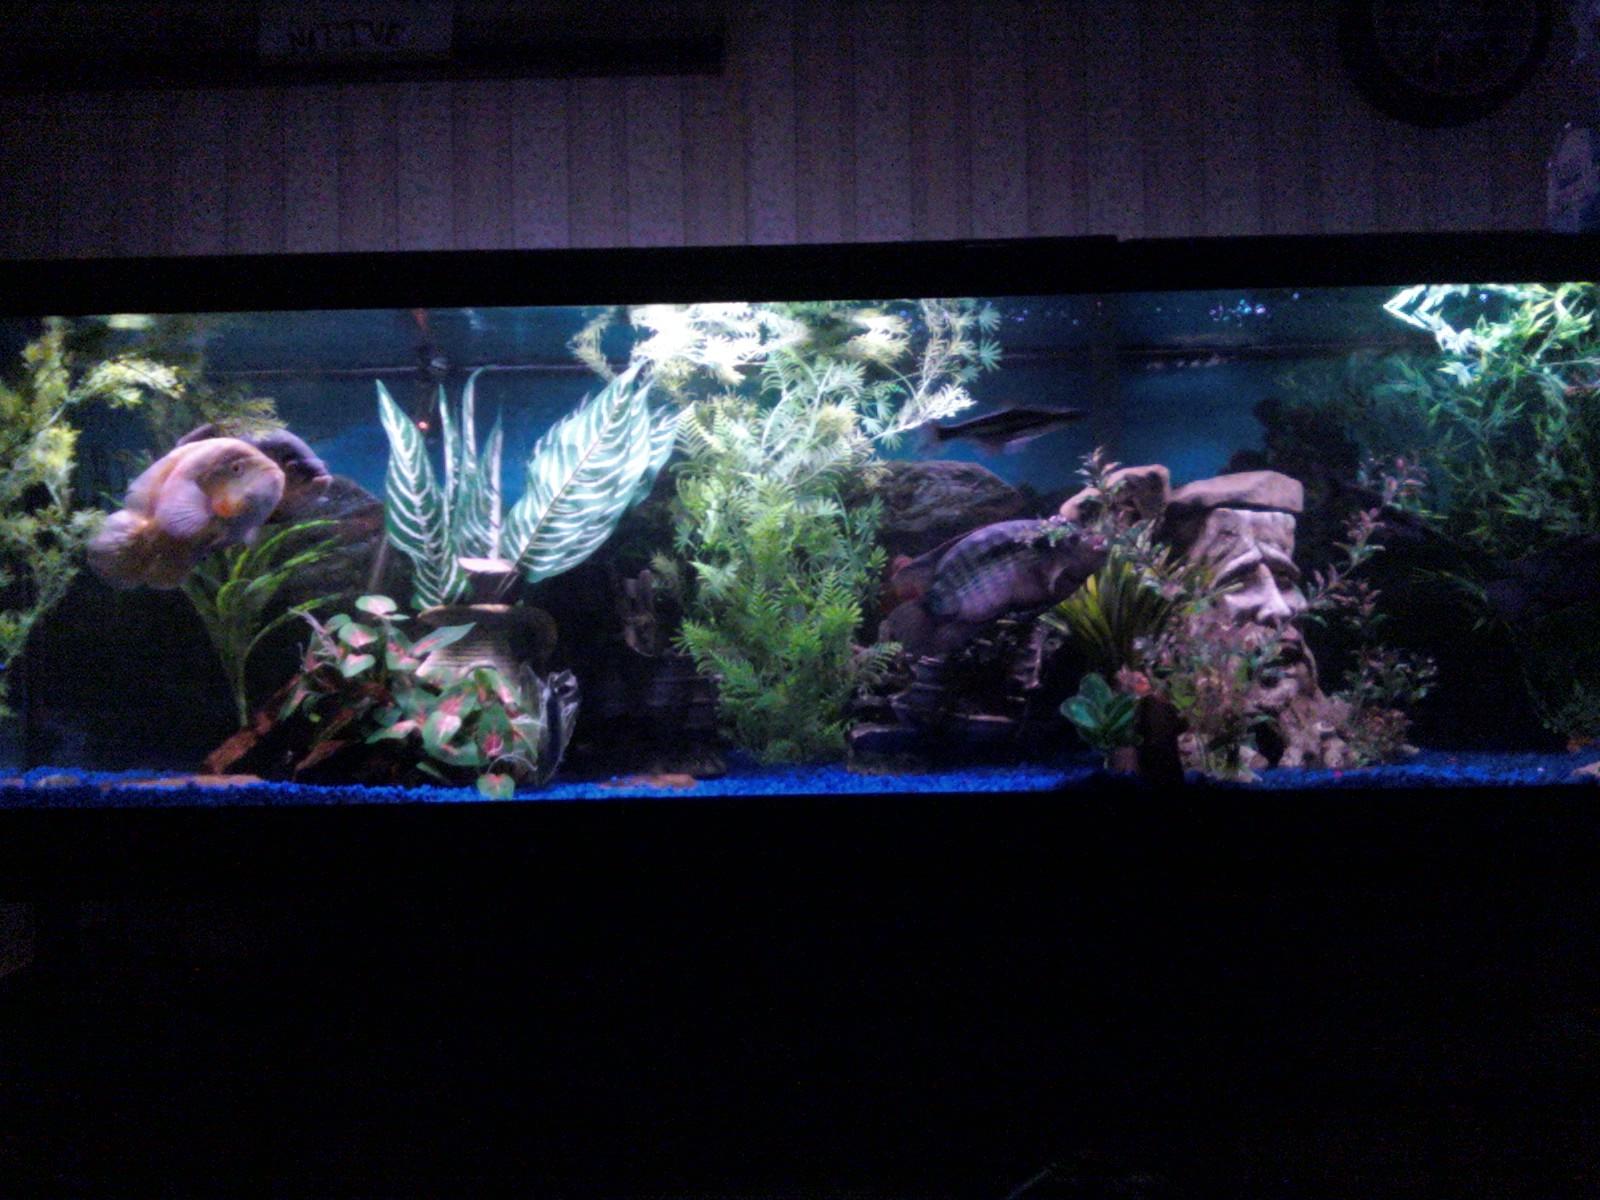 ... Photos - Related Pictures 125 Gallon Fish Tank Fish Tanks Aquariums